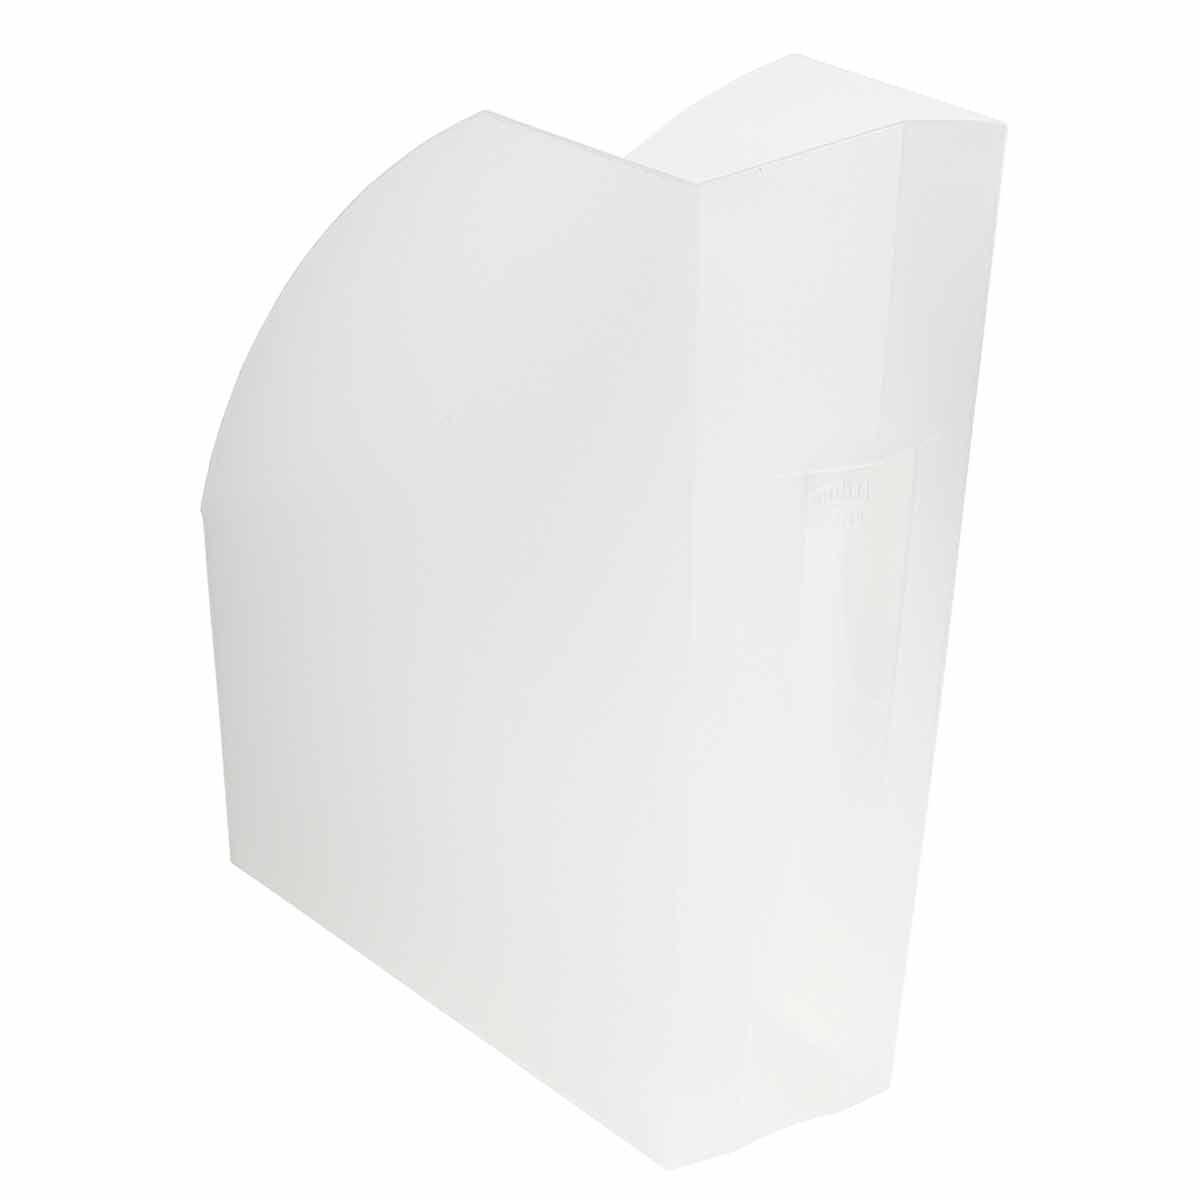 Exacompta Linicolor Magazine File Pack of 3 White